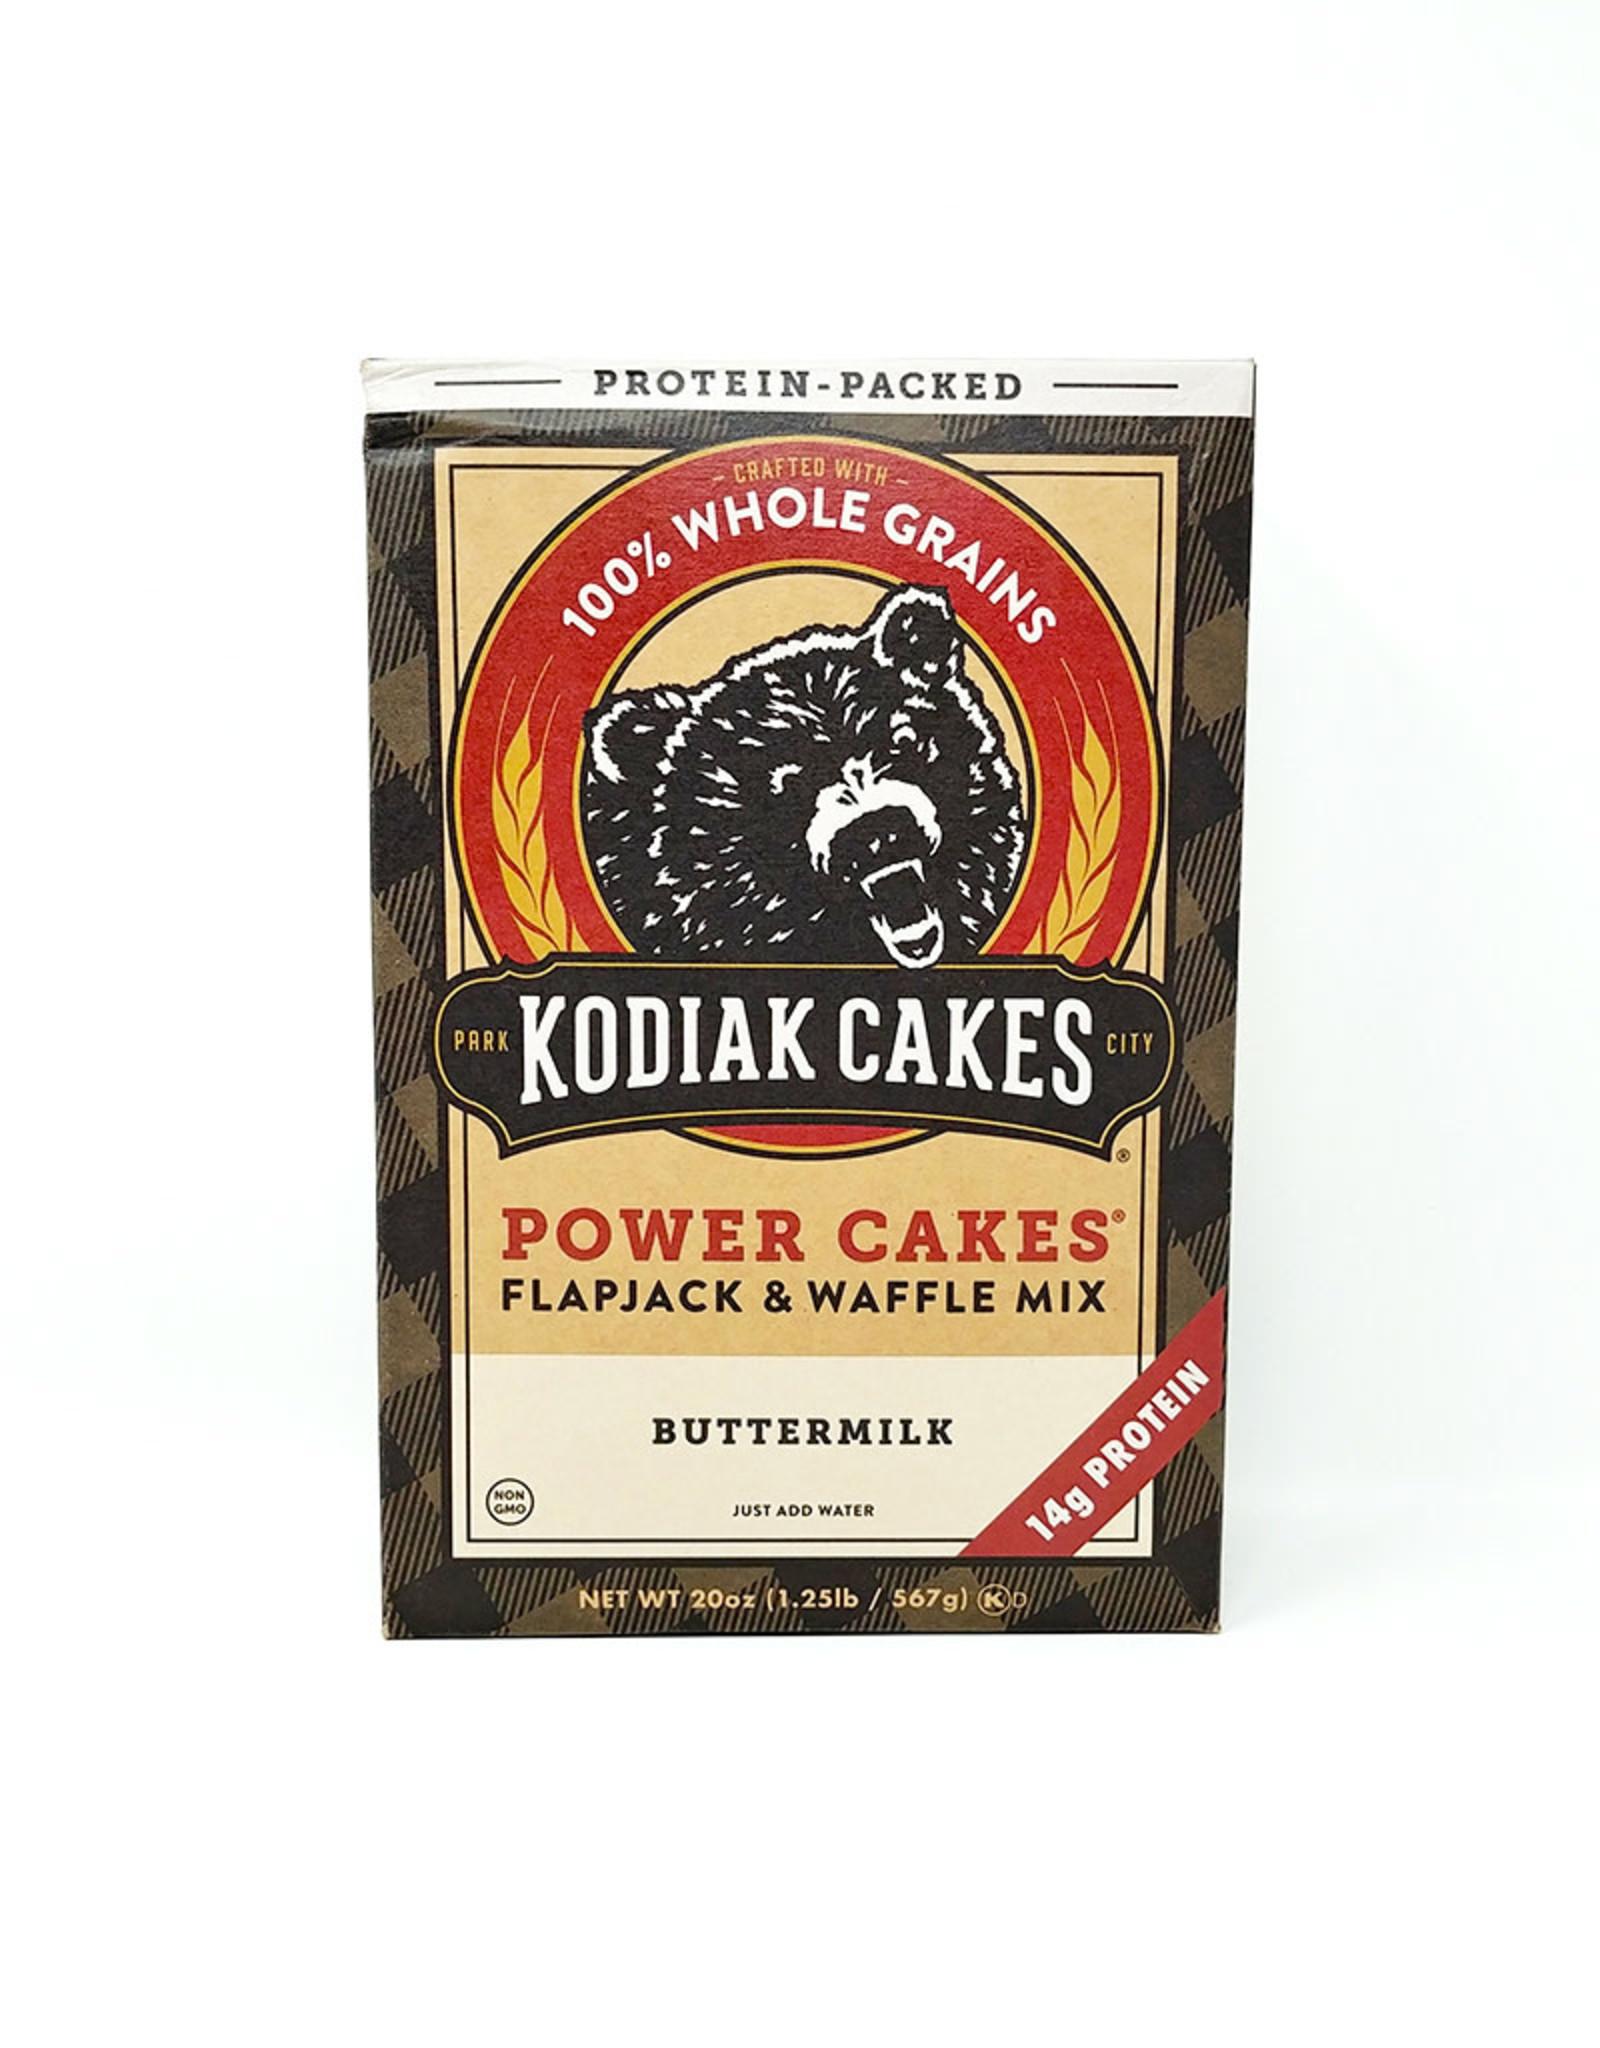 Kodiak Cakes Kodiak Cakes - Flapjack & Waffle Mix, Buttermilk